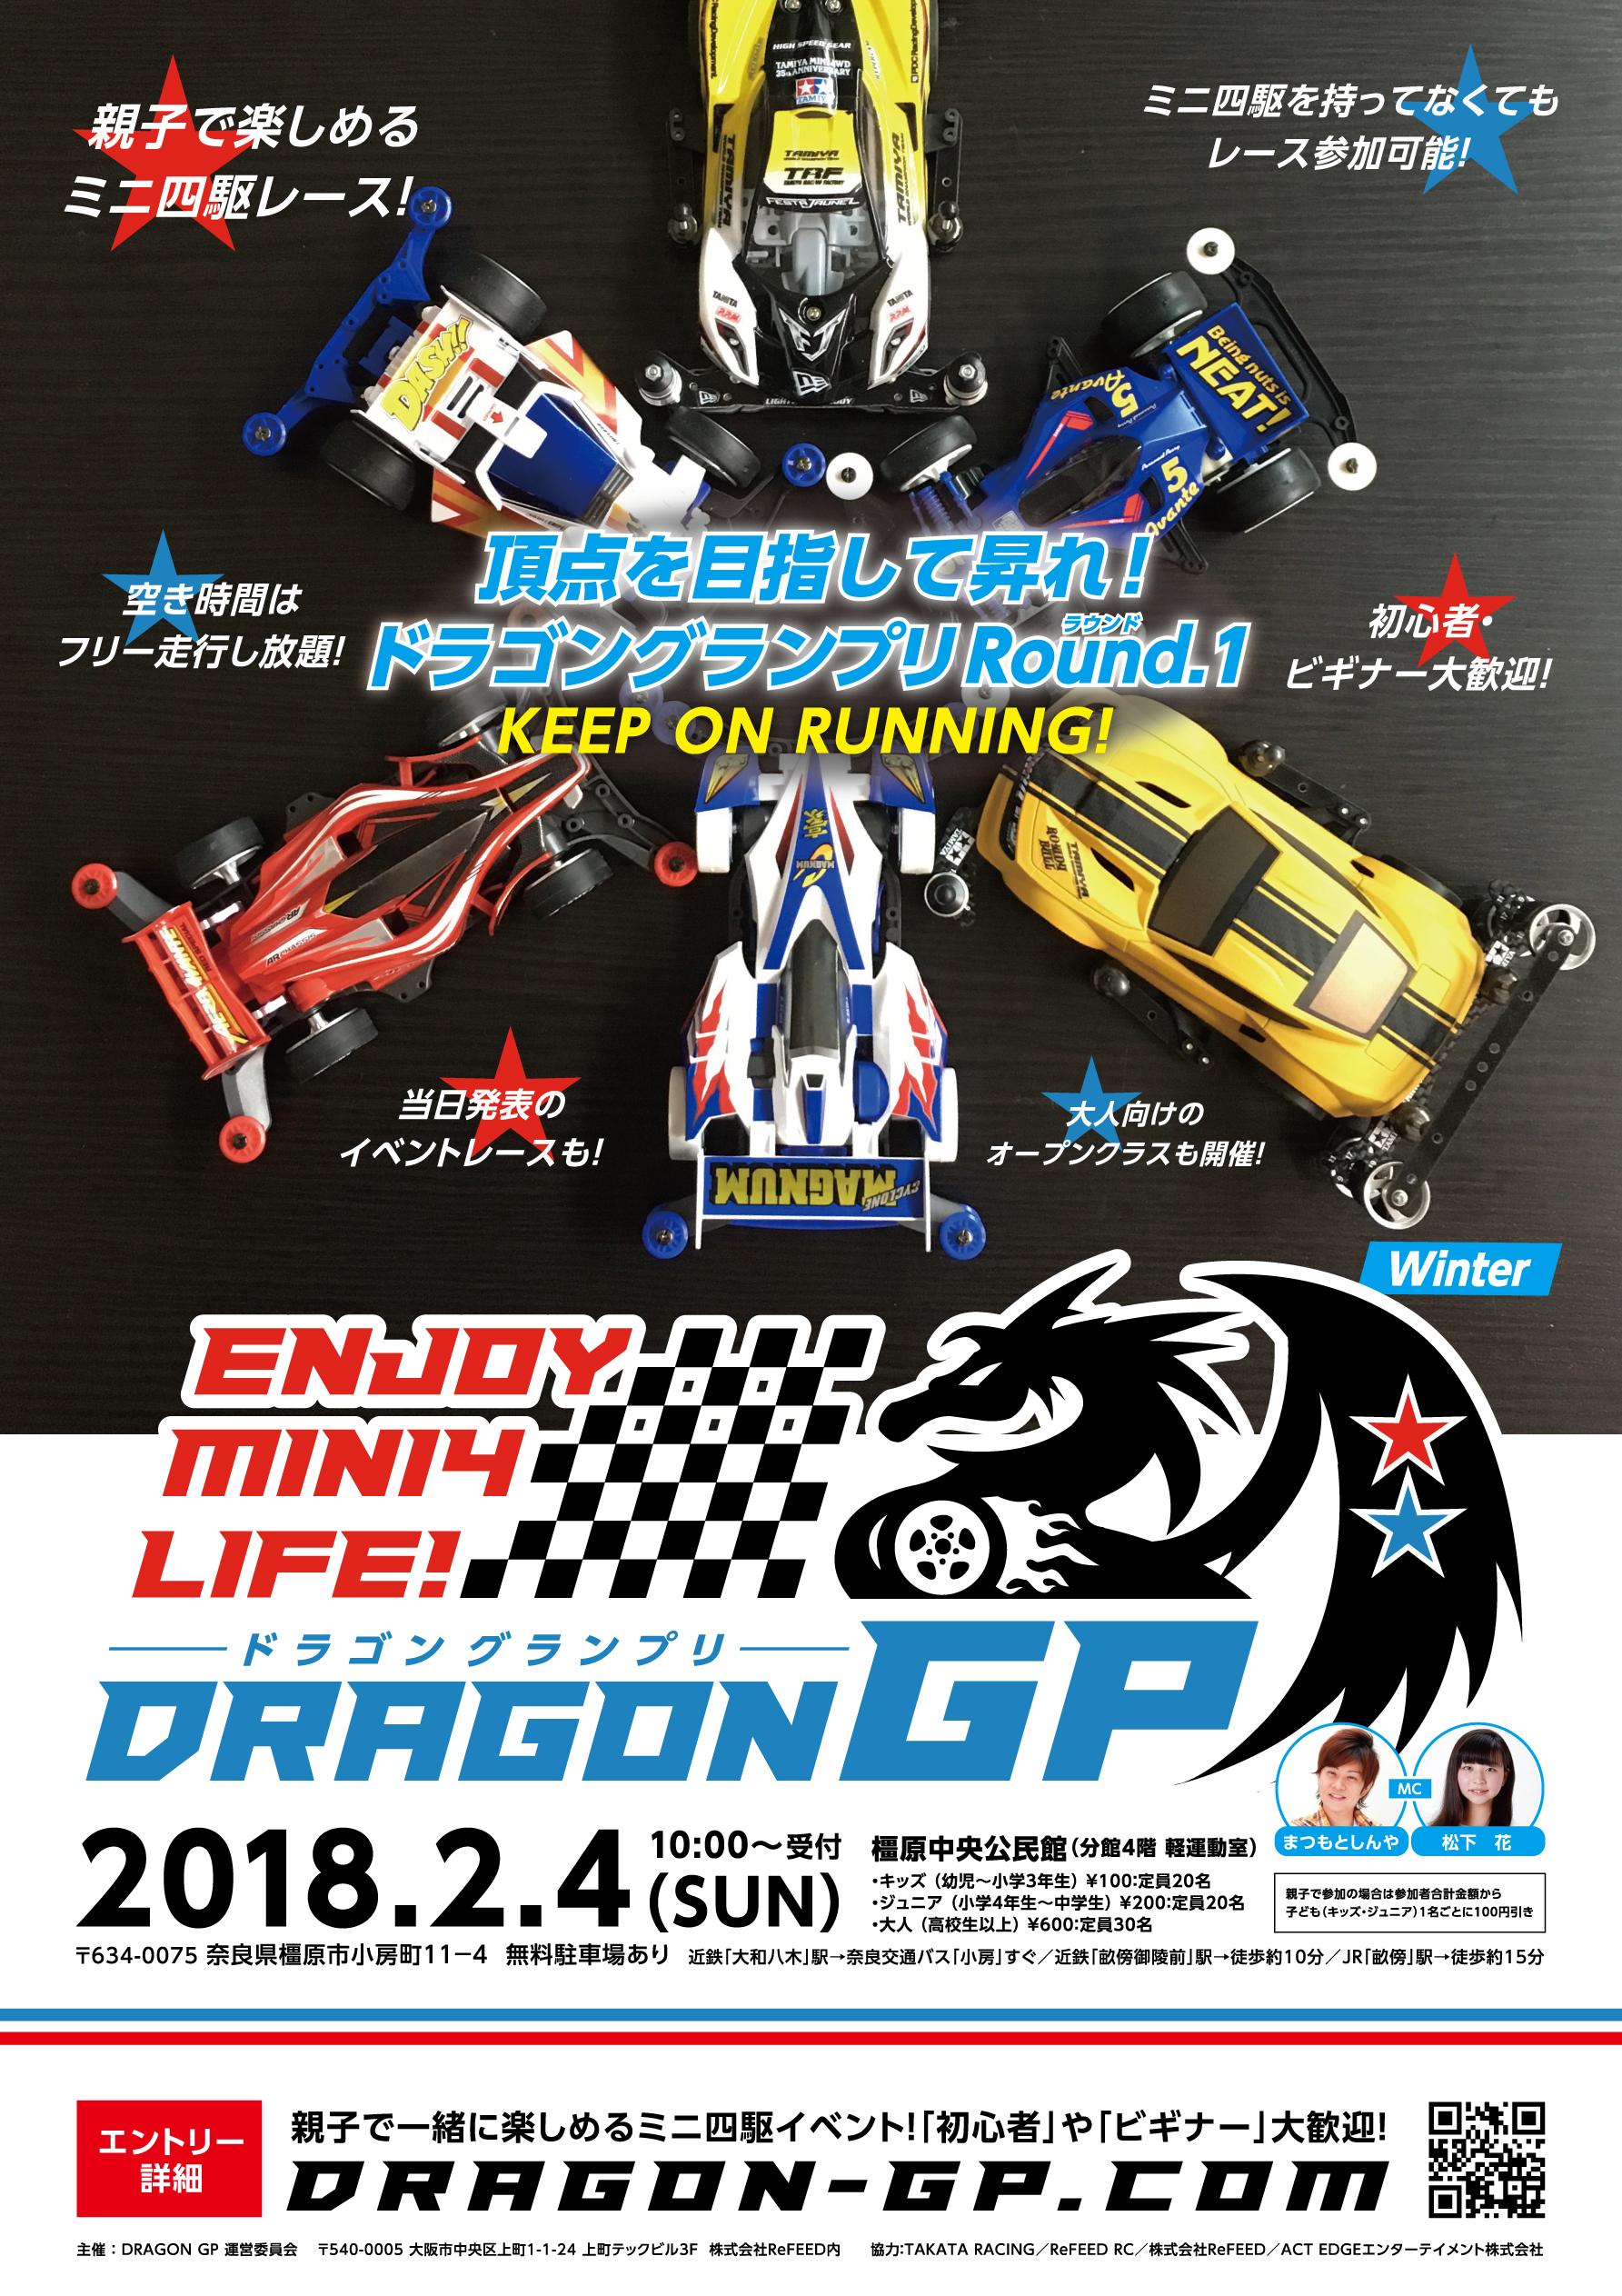 DRAGON GP Round1 Winter